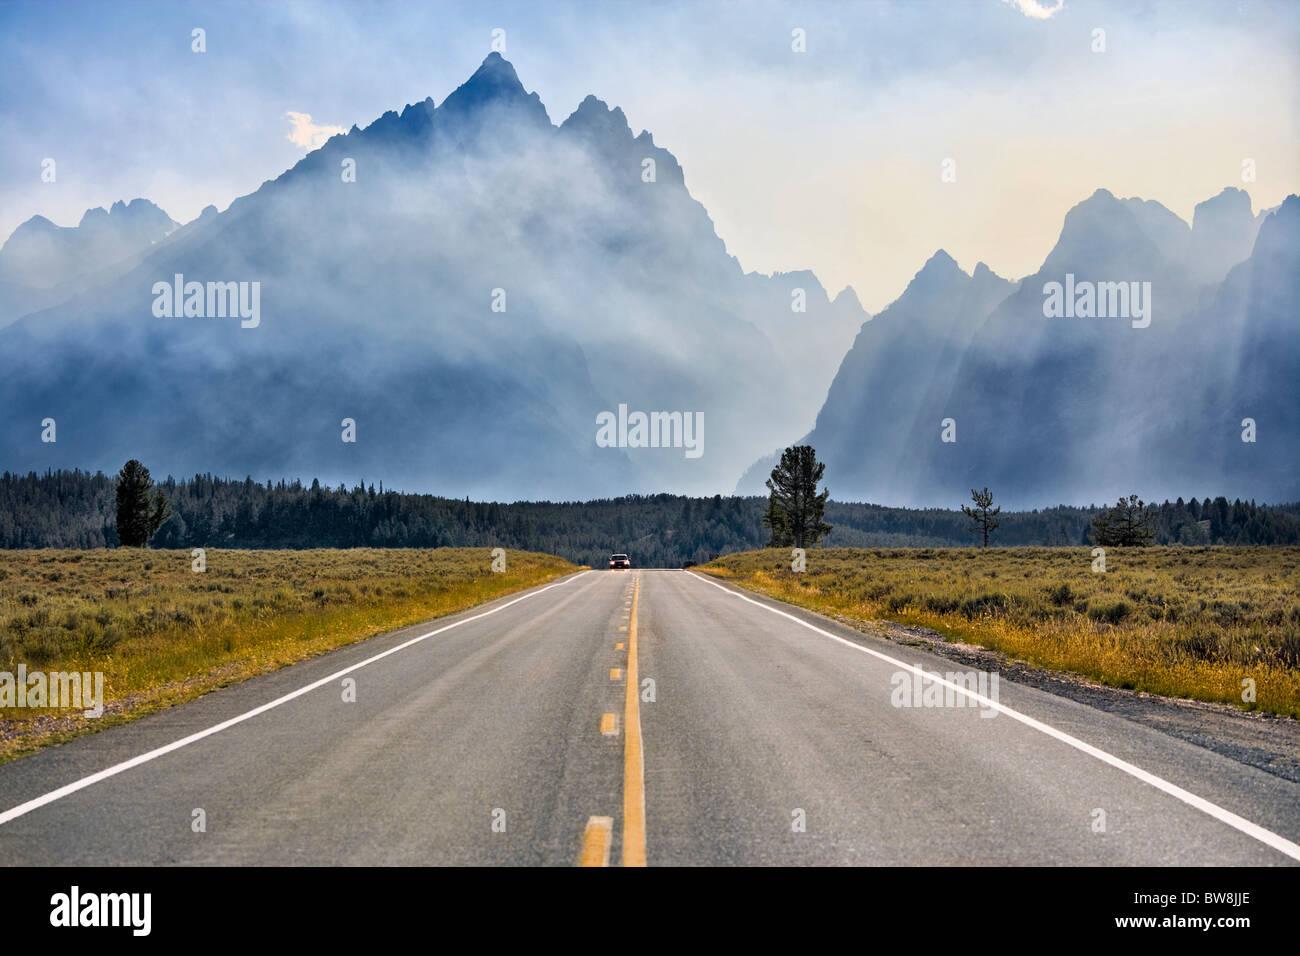 https://c7.alamy.com/comp/BW8JJE/mount-teton-in-grand-teton-national-park-wyoming-jenny-lake-loop-road-BW8JJE.jpg